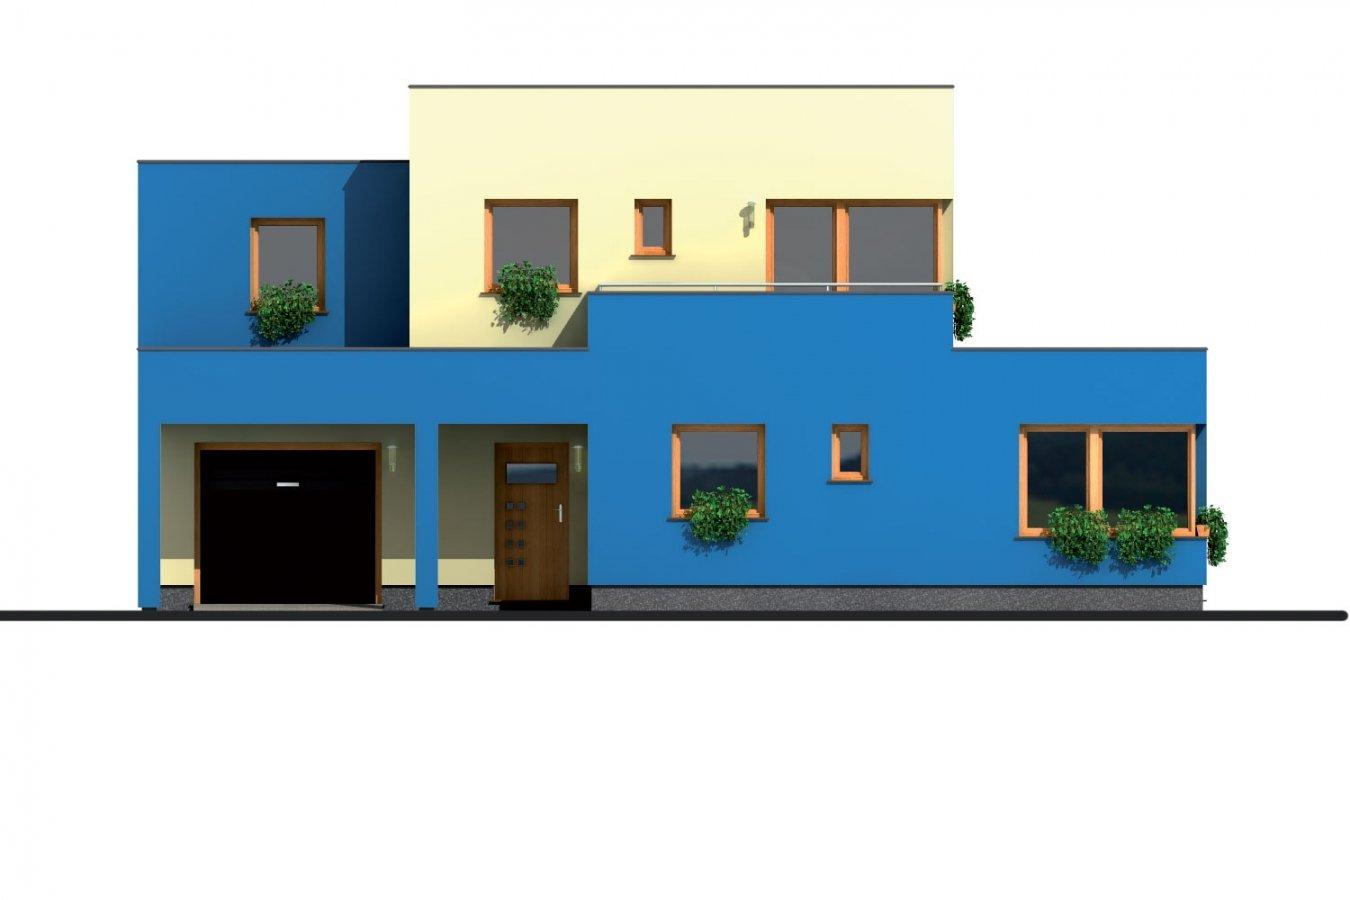 Pohľad 1. - Projekt moderného rodinného domu s plochou strechou a garážou